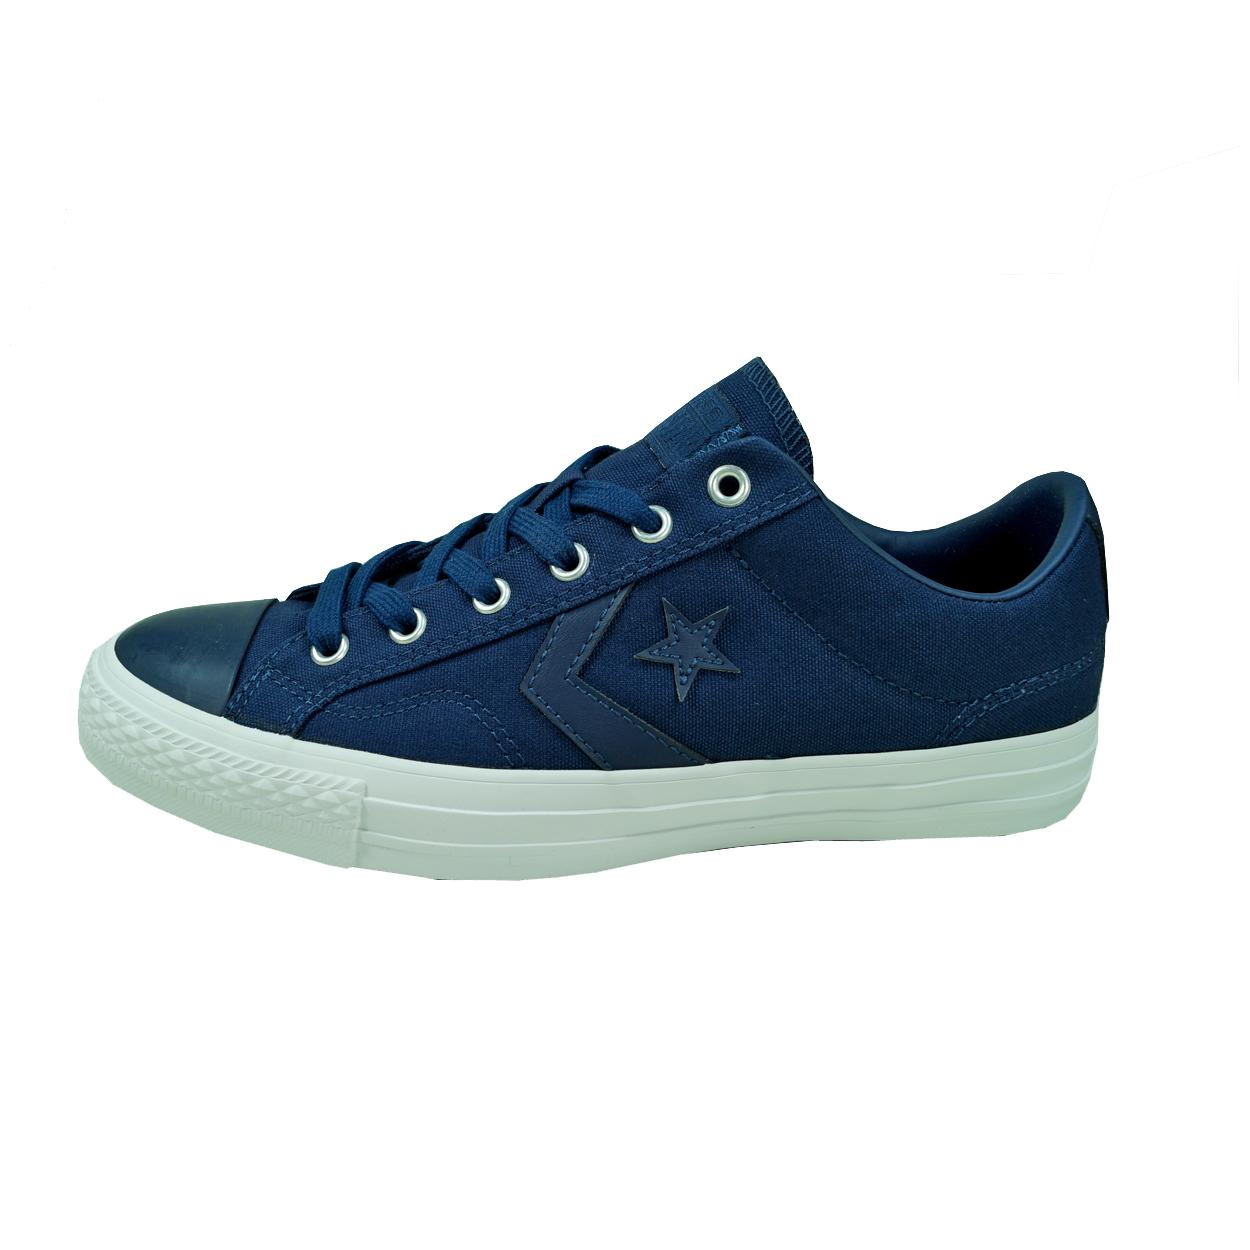 2fb633e5289a6d Converse Herren Schuhe Star Player OX Blau 44